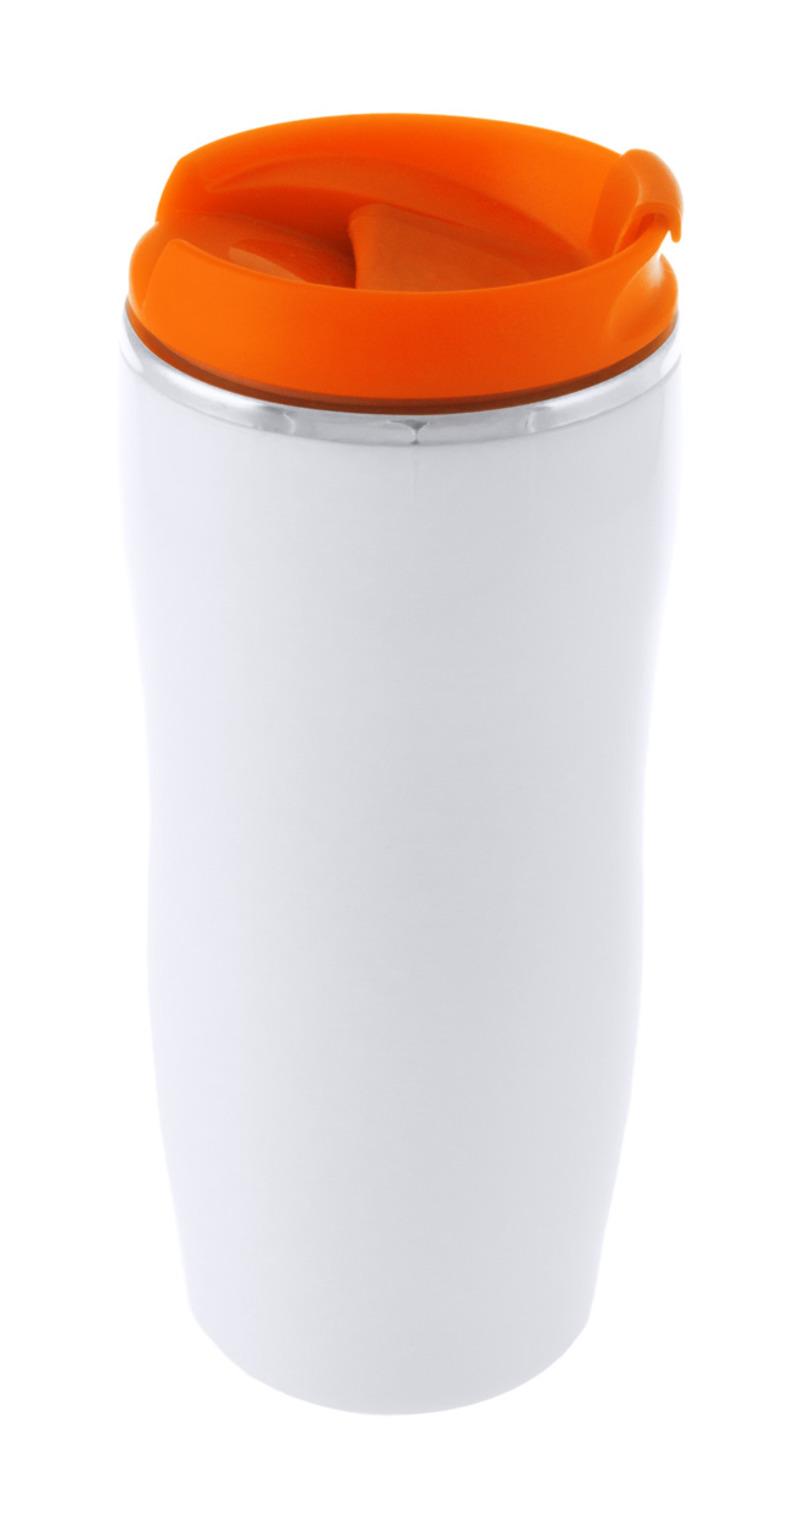 Zicox thermo mug